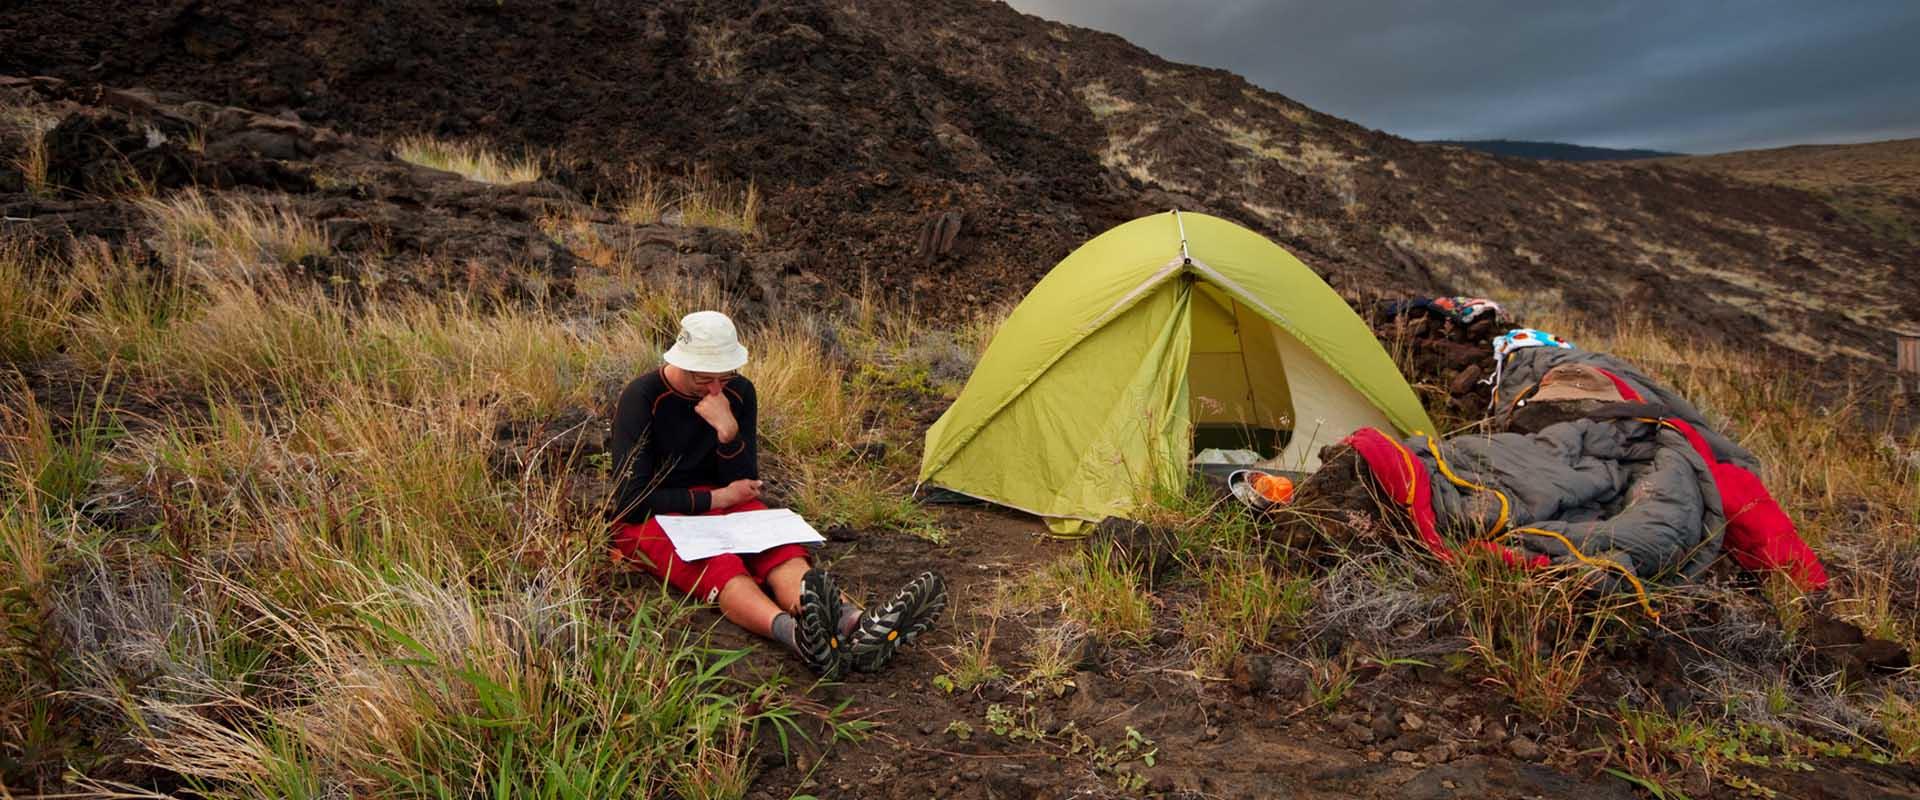 Outdoor Gear Hunting Fishing Gear Camping Equipment